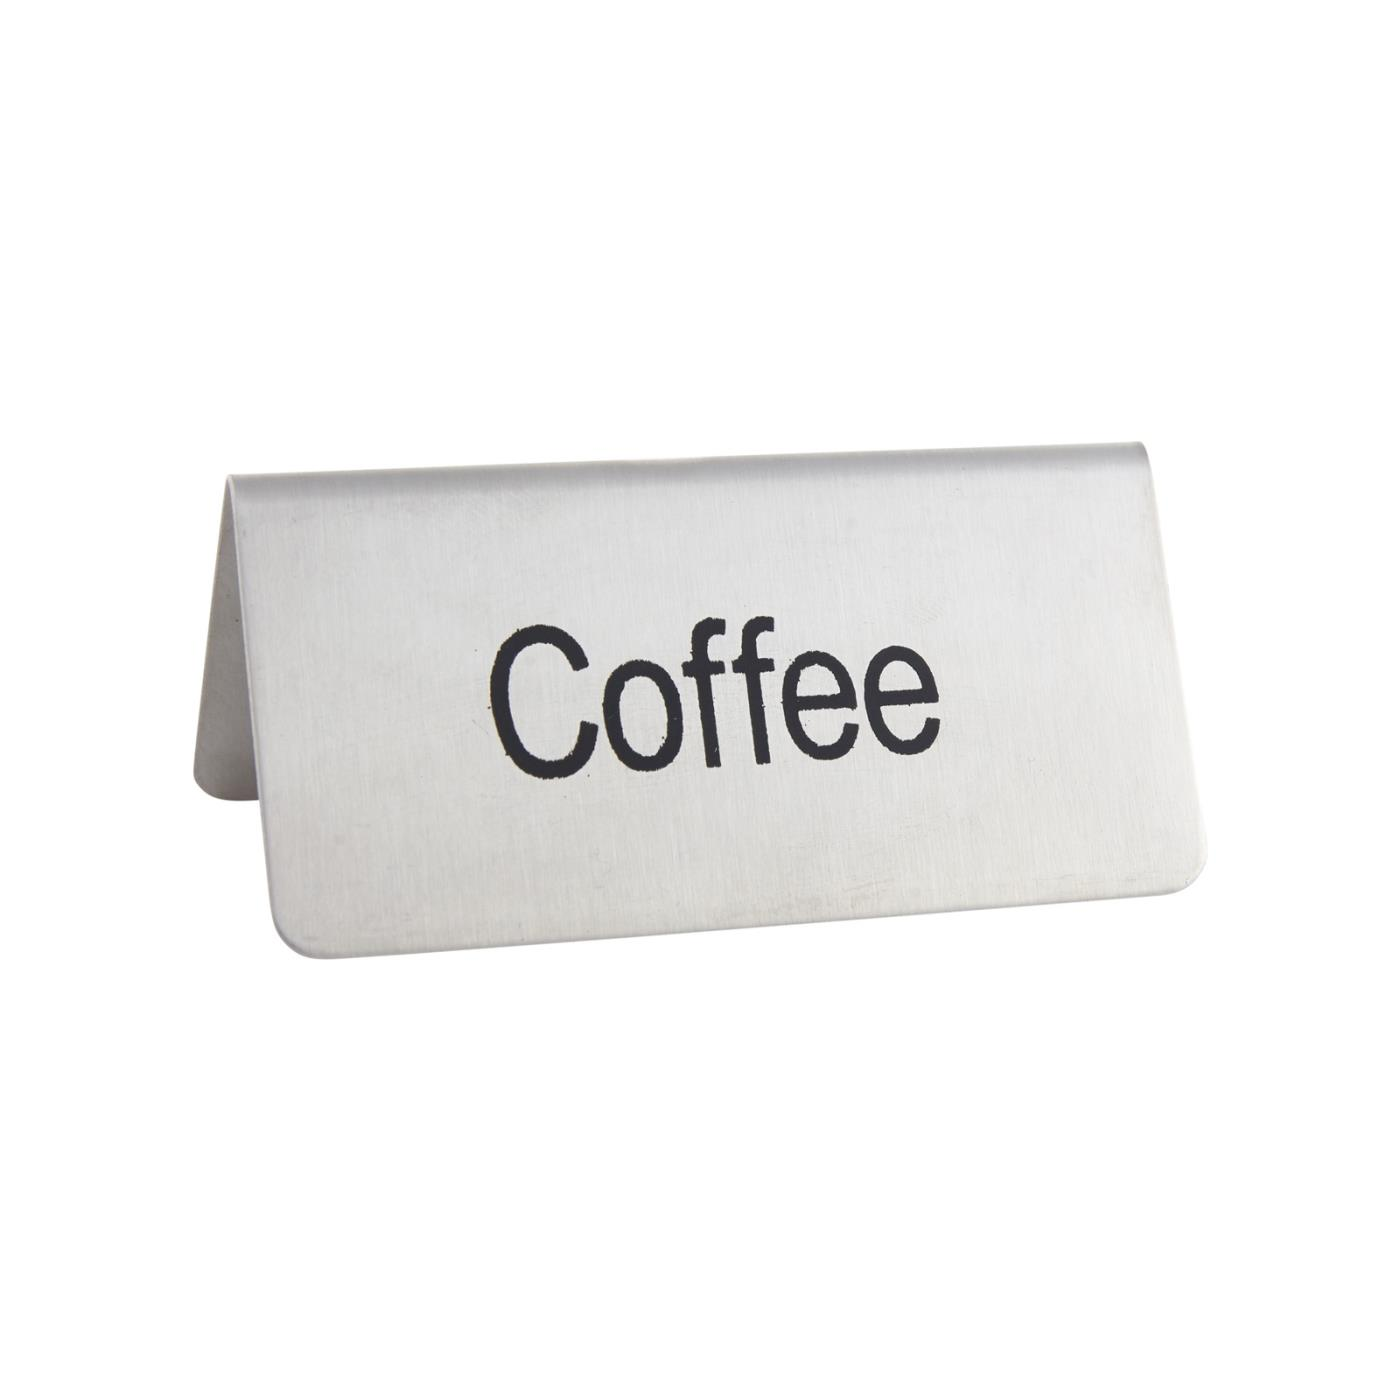 Coffee Tag - Coffee